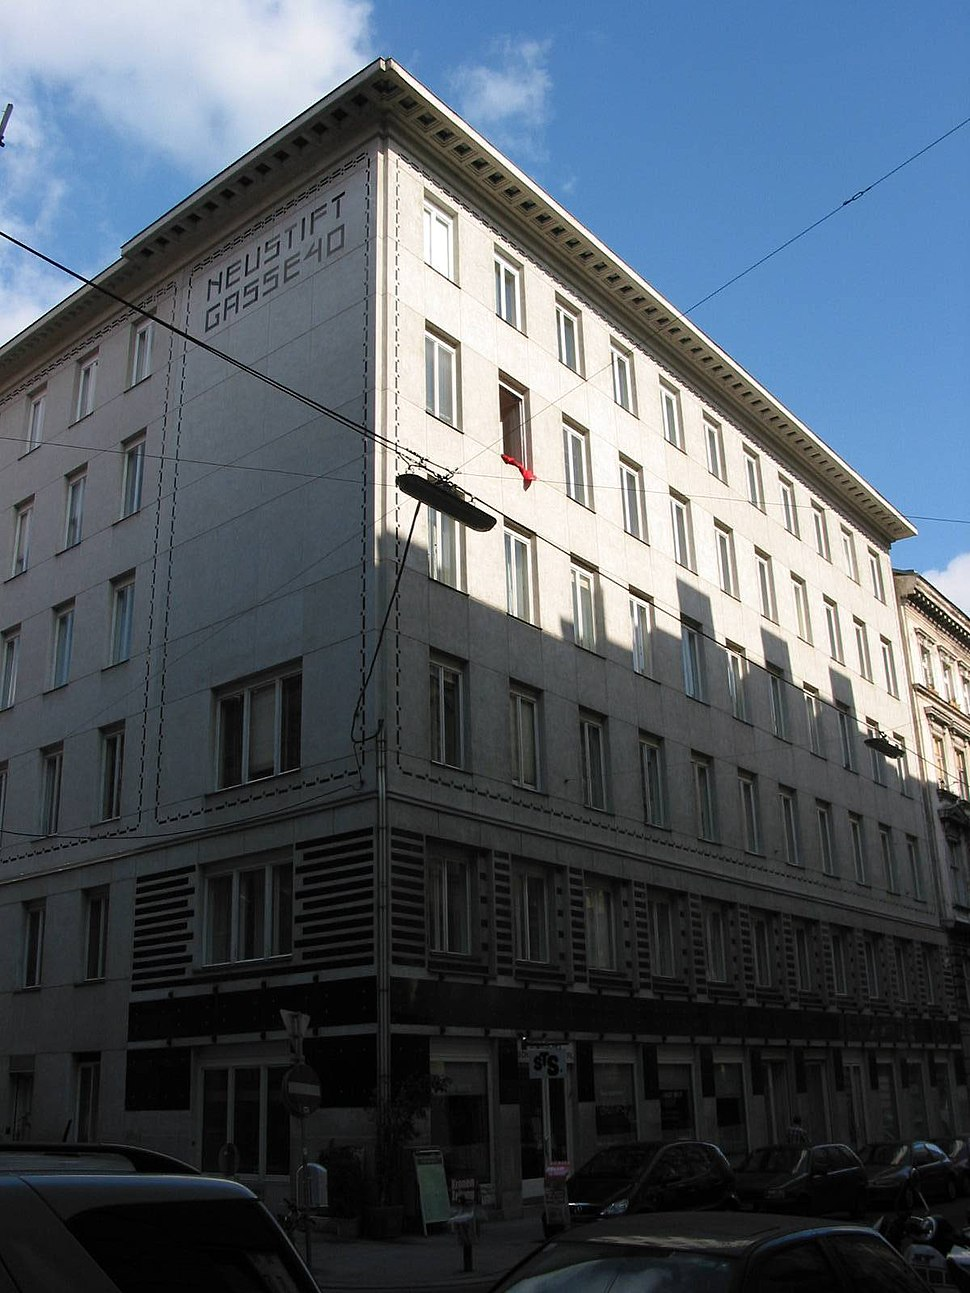 WienOttoWagnerWohnhaus